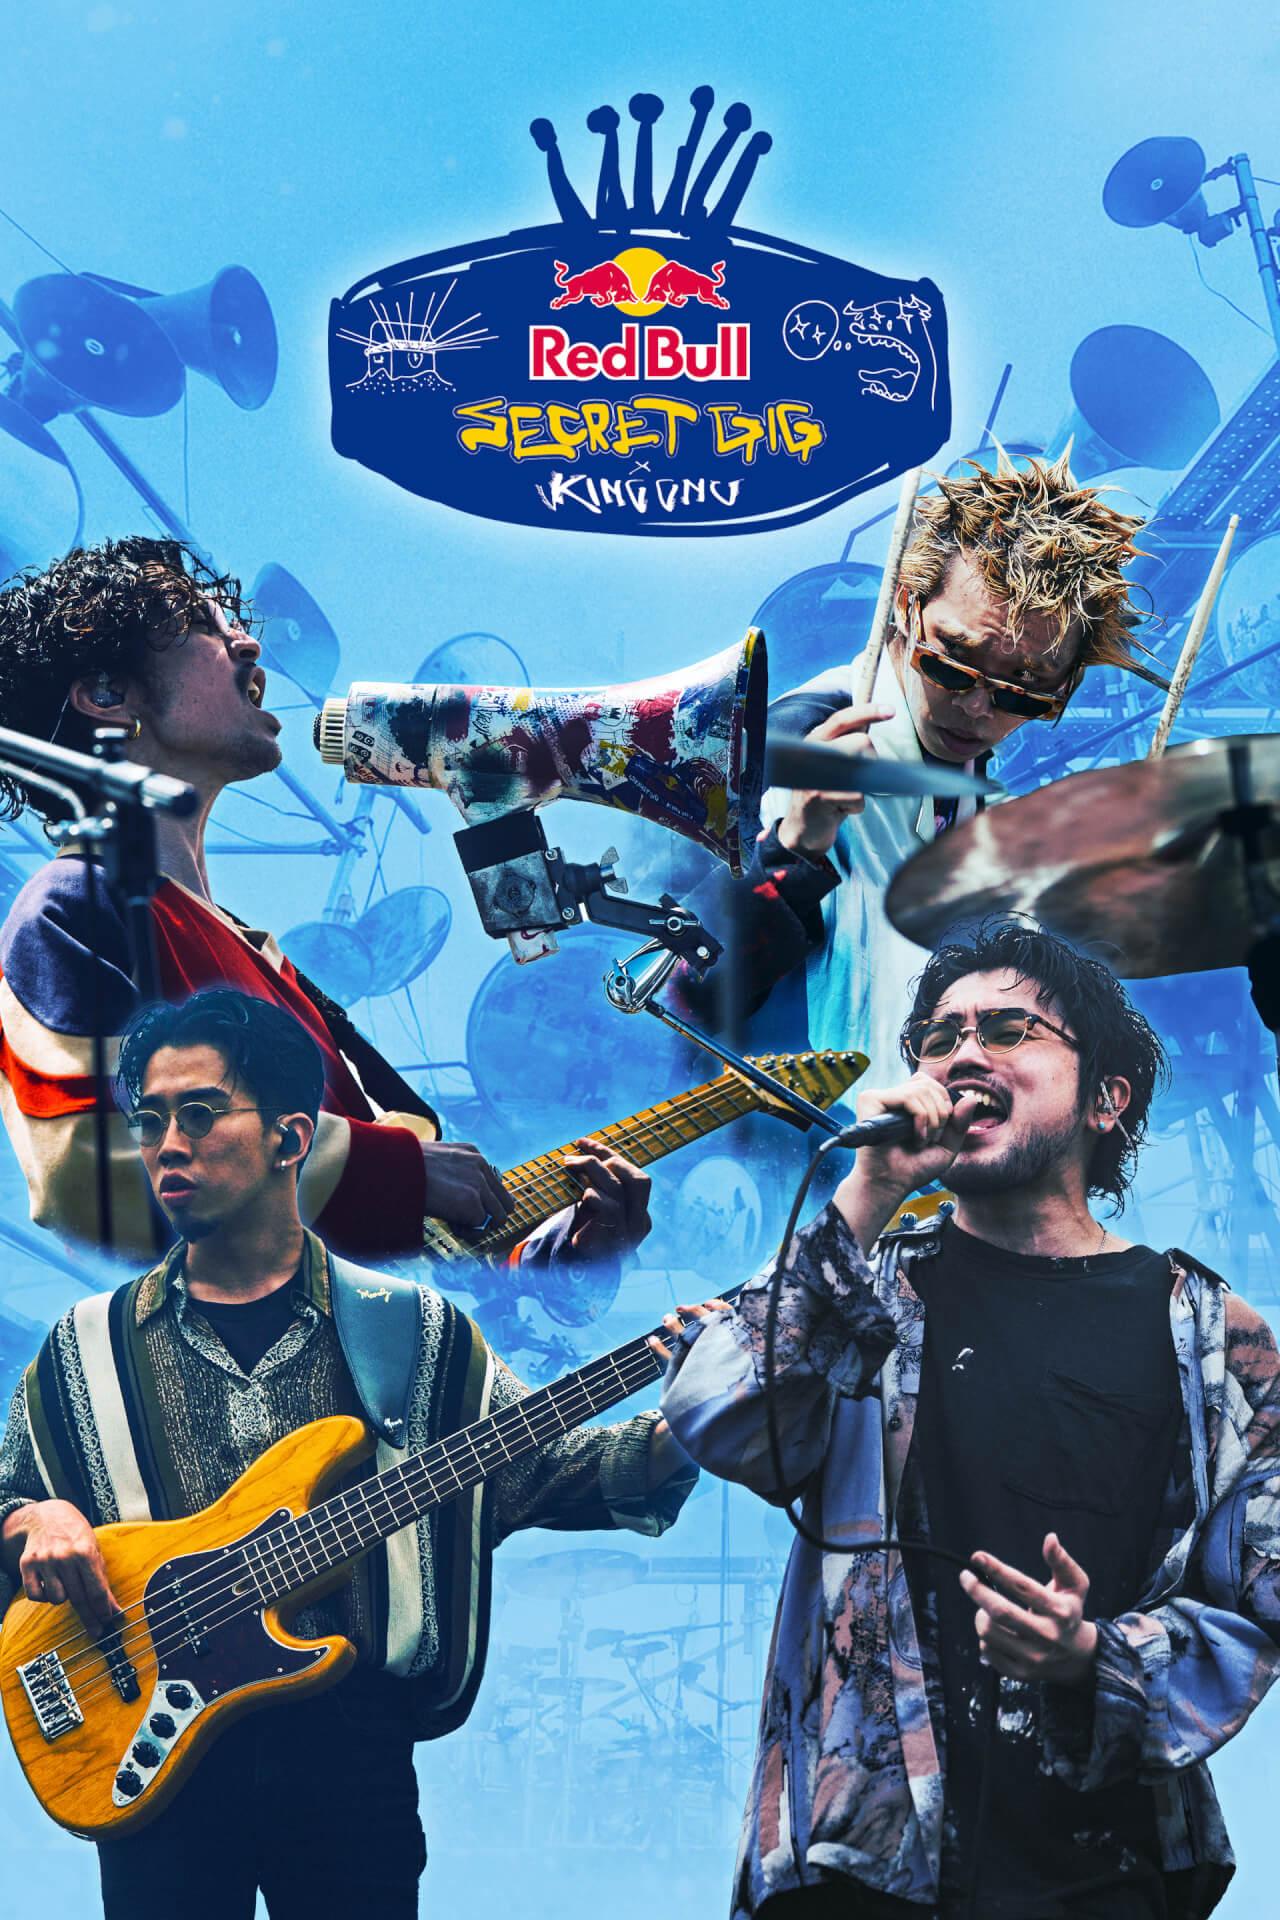 King Gnuとレッドブルによるシークレットライブ<Red Bull Secret Gig>のメイキング映像が期間限定配信決定! music_210721_Red-Bull-Secret-Gig4